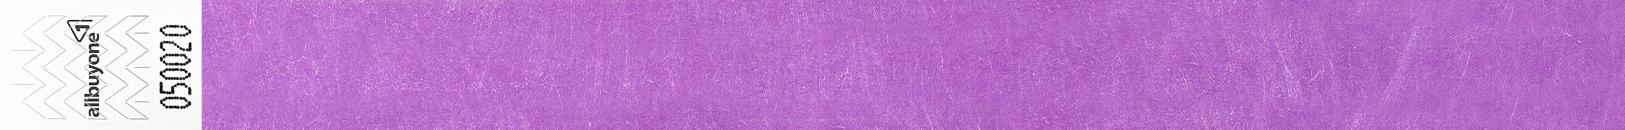 https://cdn.allbuyone.com/media/image/e4/f2/ee/tyvek-19mm-1625x130px-lavendel.jpg